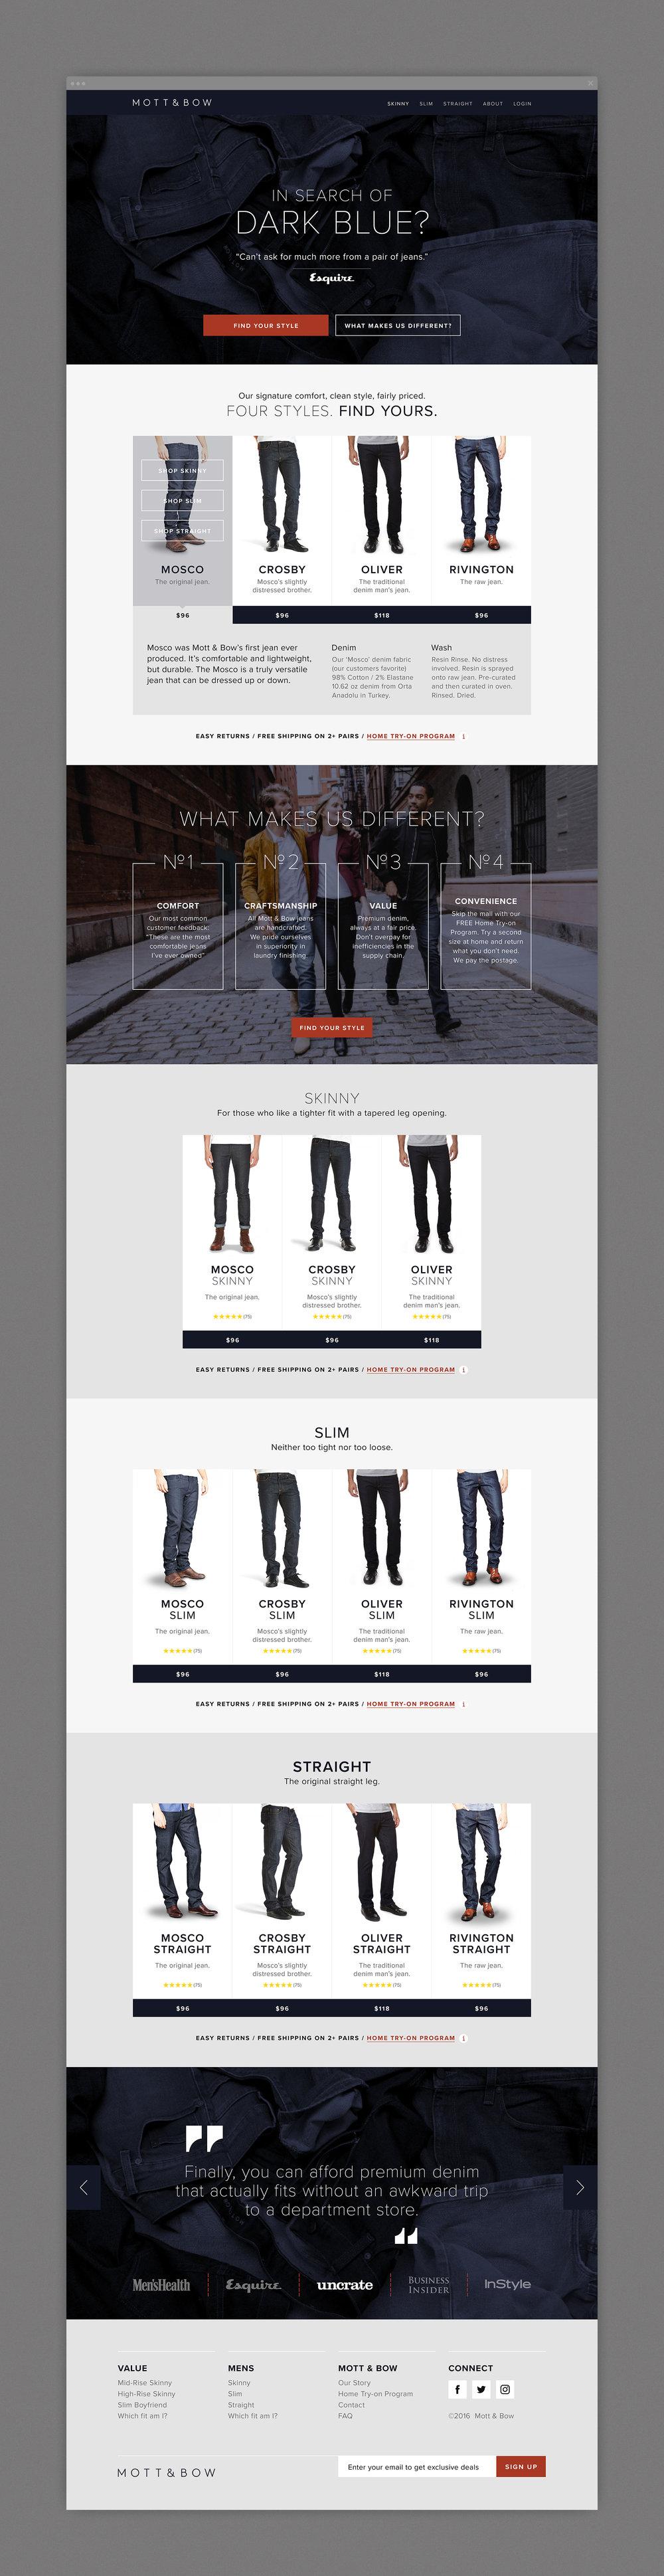 Mott & Bow Desktop Landing Page Design.jpg